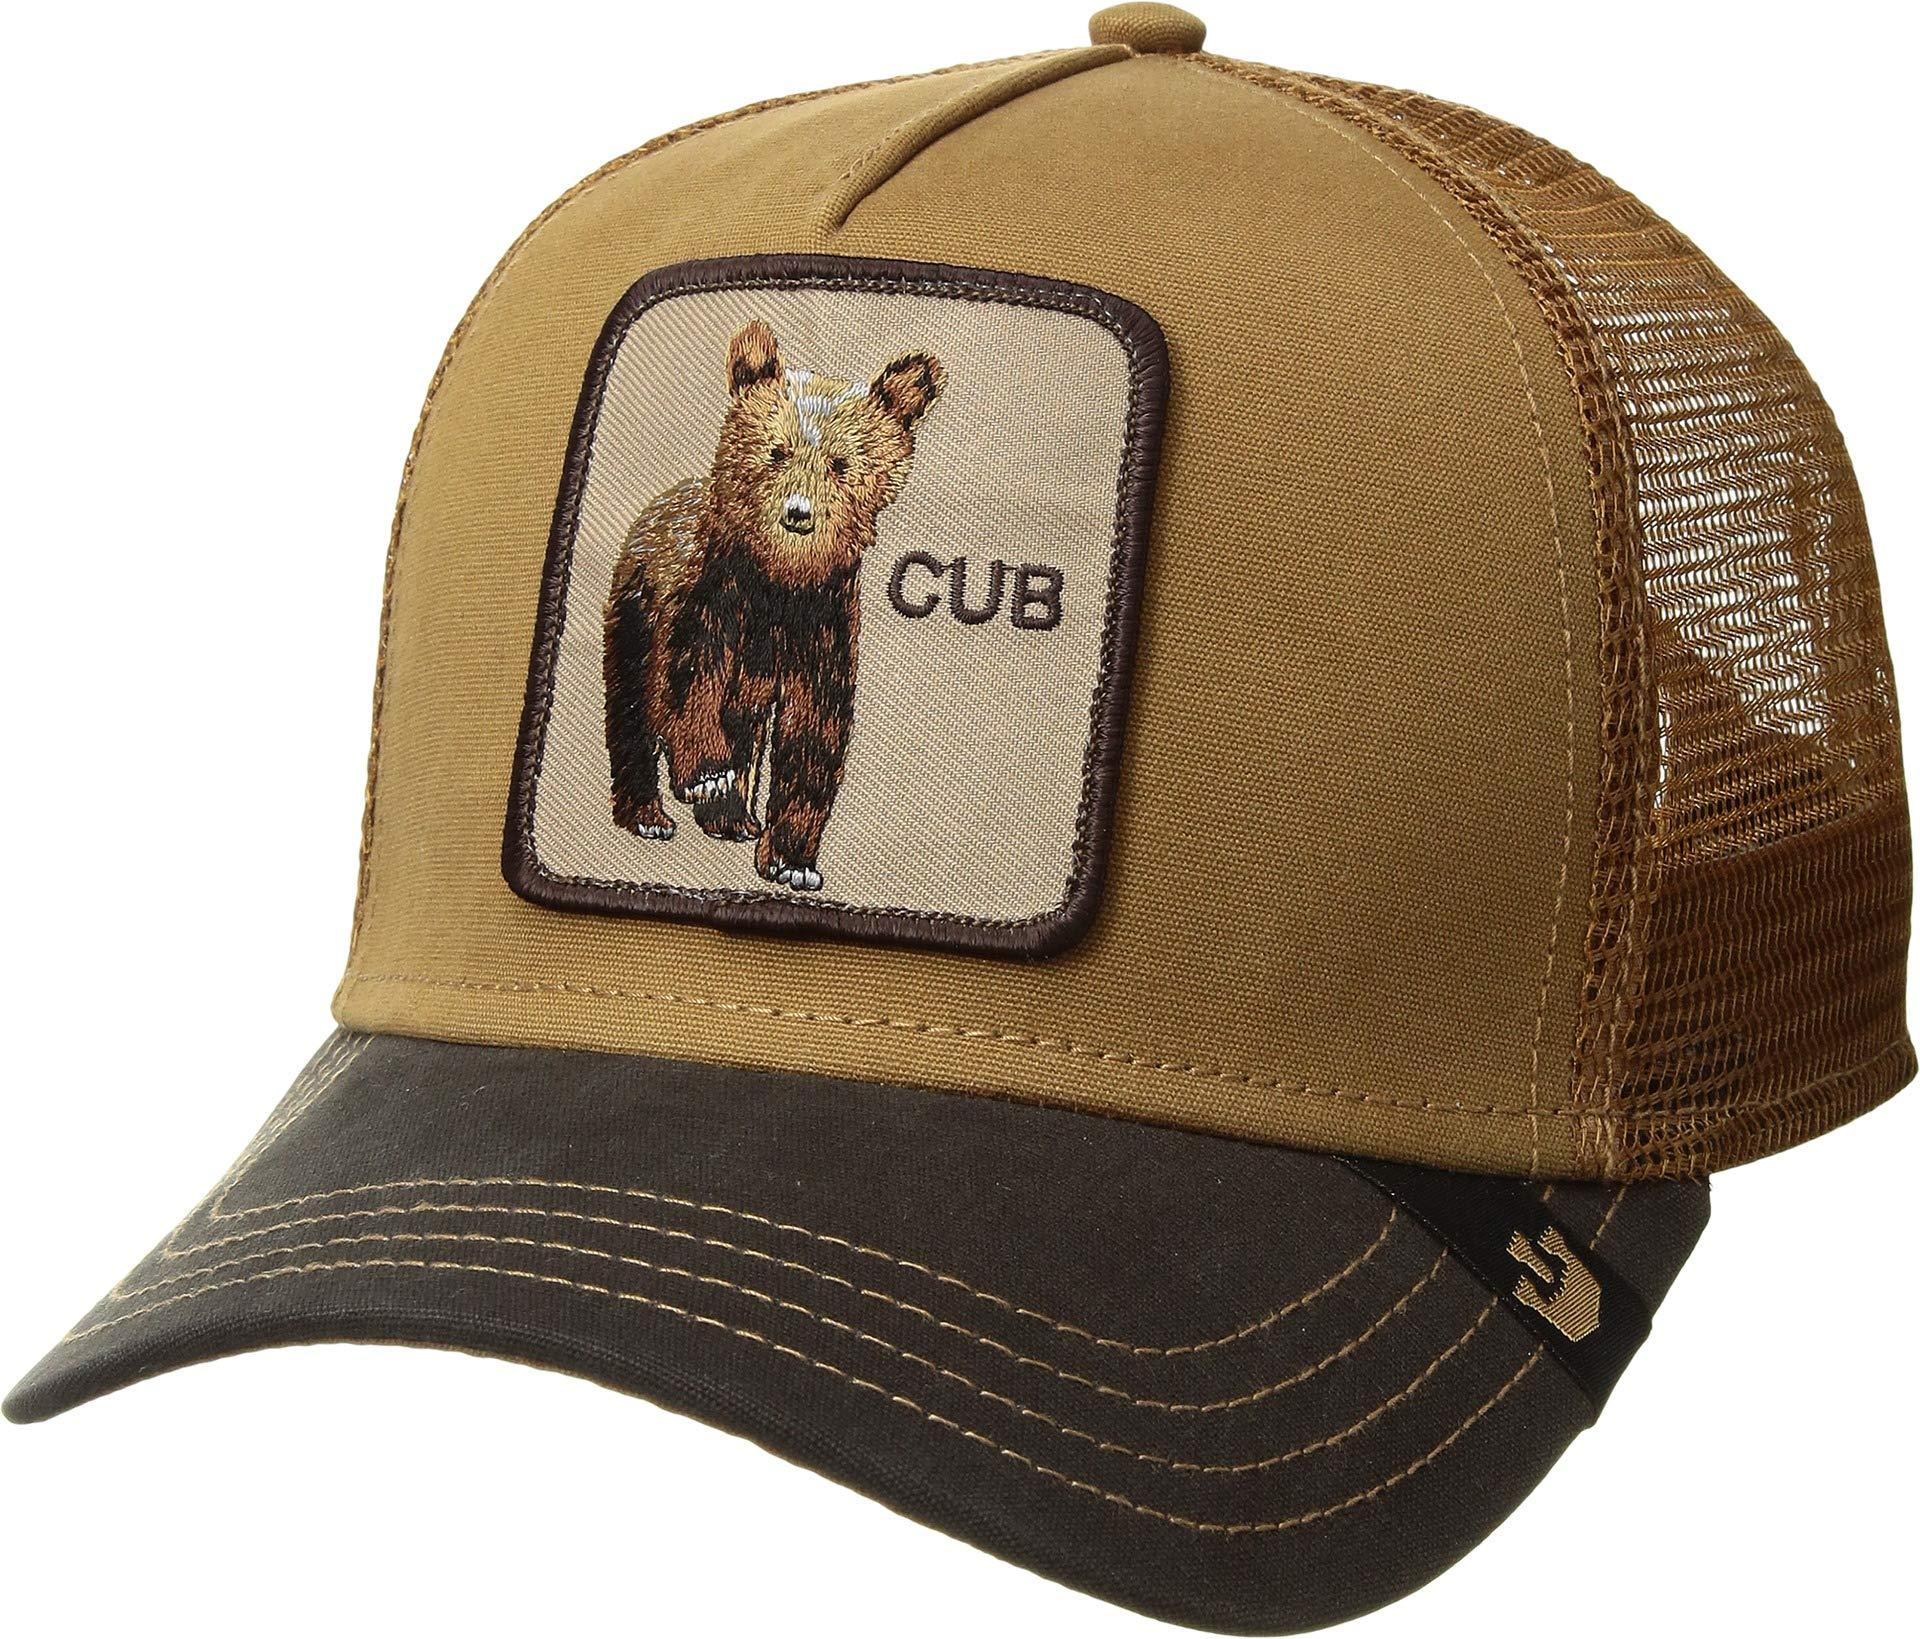 230f5cd6c07b5c Galleon - Goorin Bros. Men's Animal Farm Trucker Hat, Brown Cub One Size